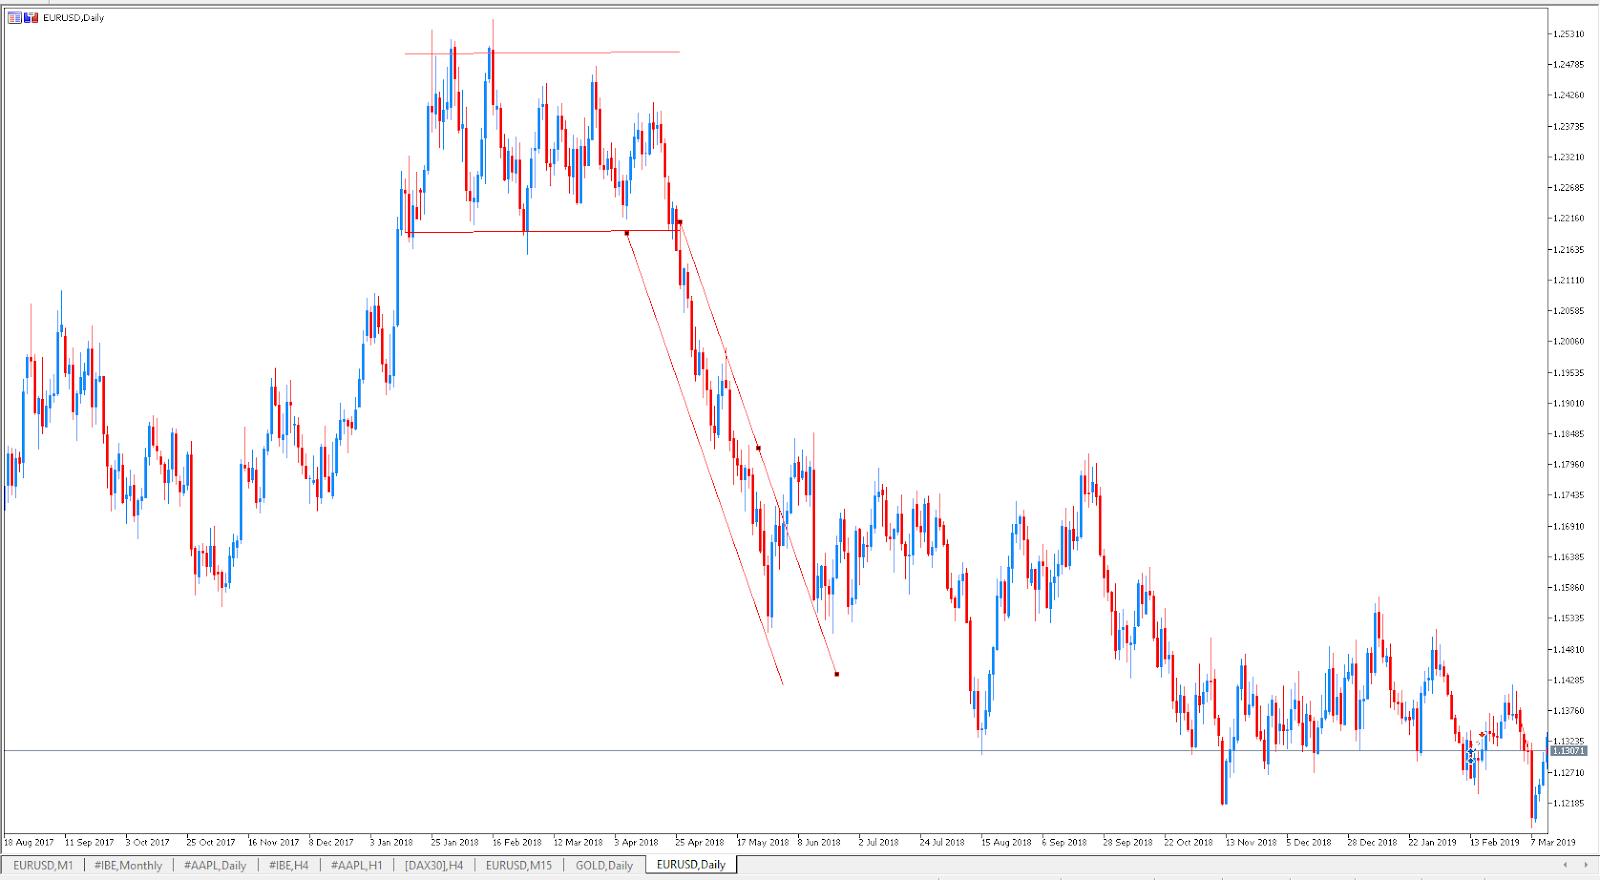 Estrategia de Trading tendencial